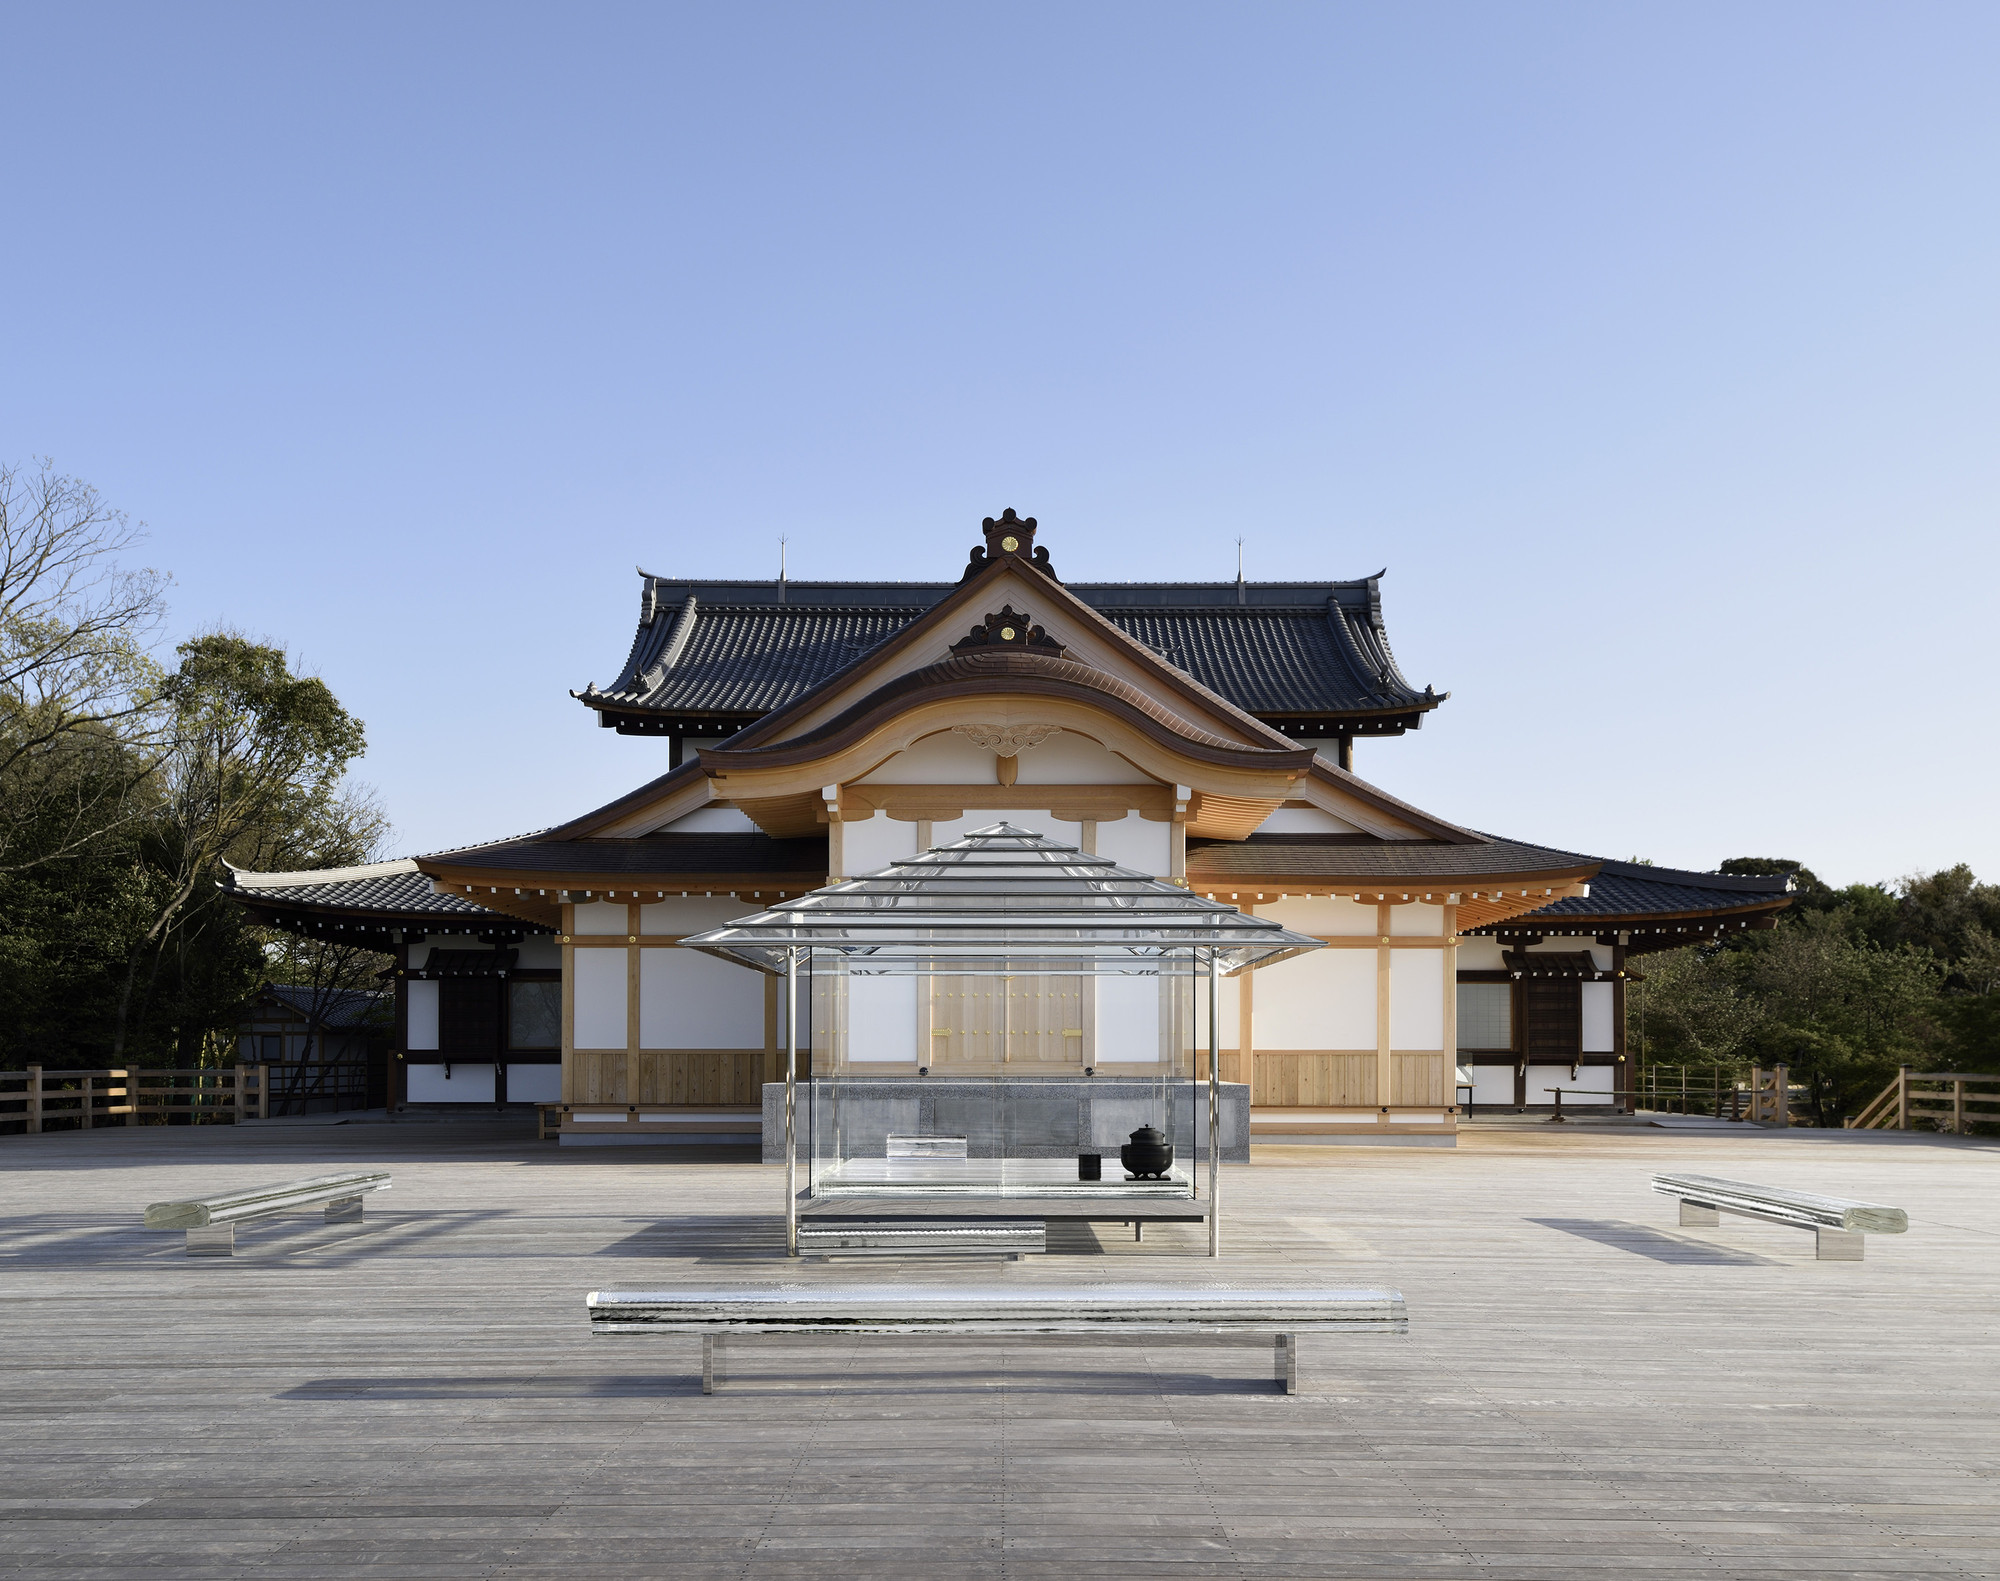 KOU-AN Glass Tea House / Tokujin Yoshioka, © Yasutake Kondo